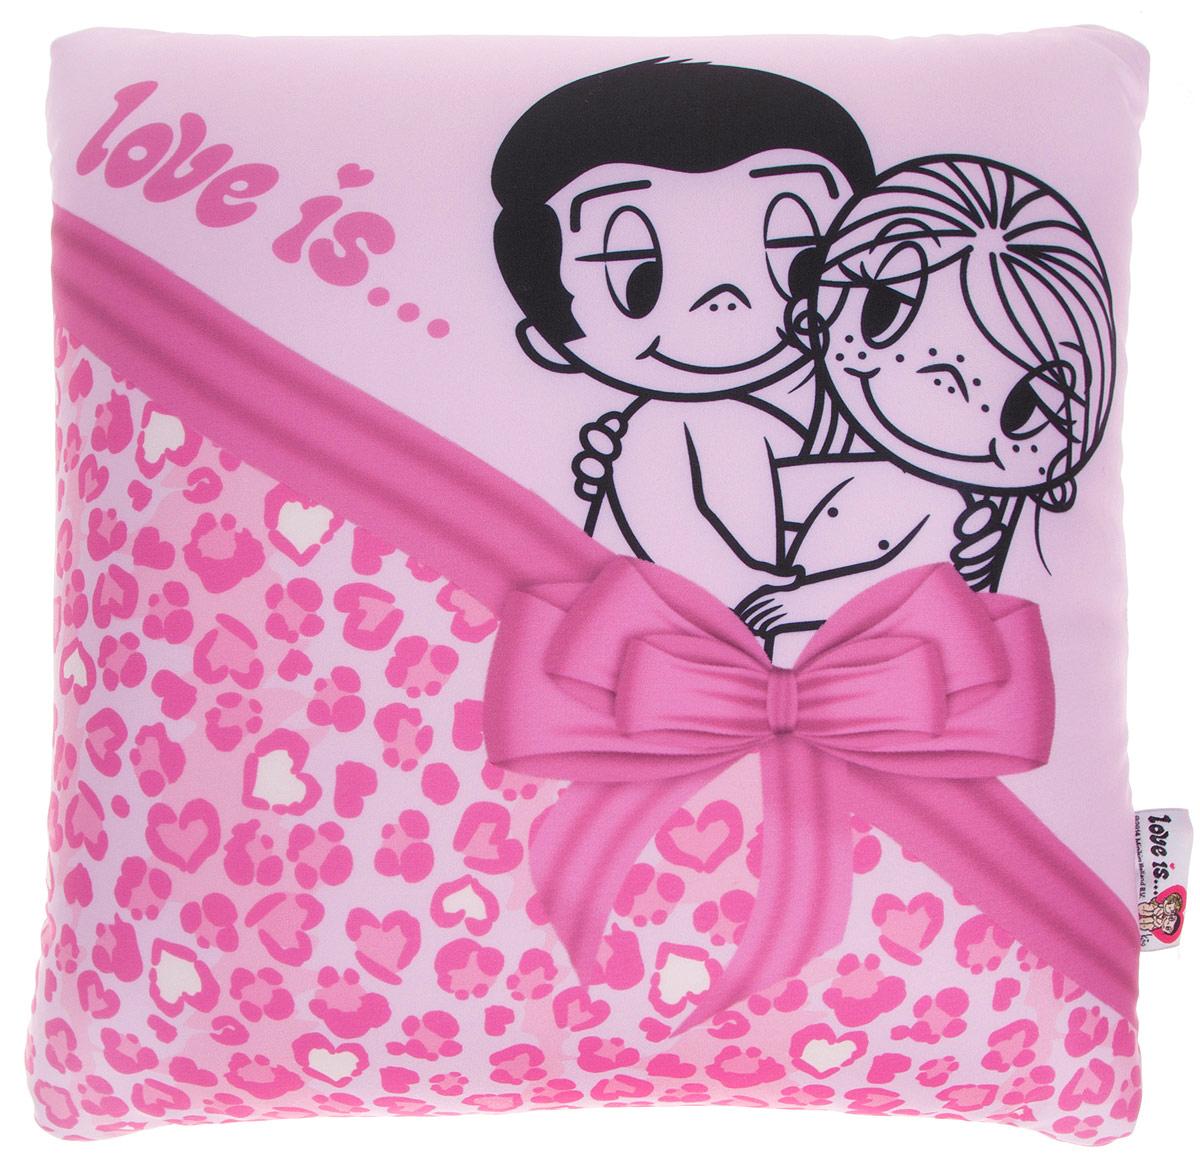 Maxi Toys Подушка Love Is цвет розовый